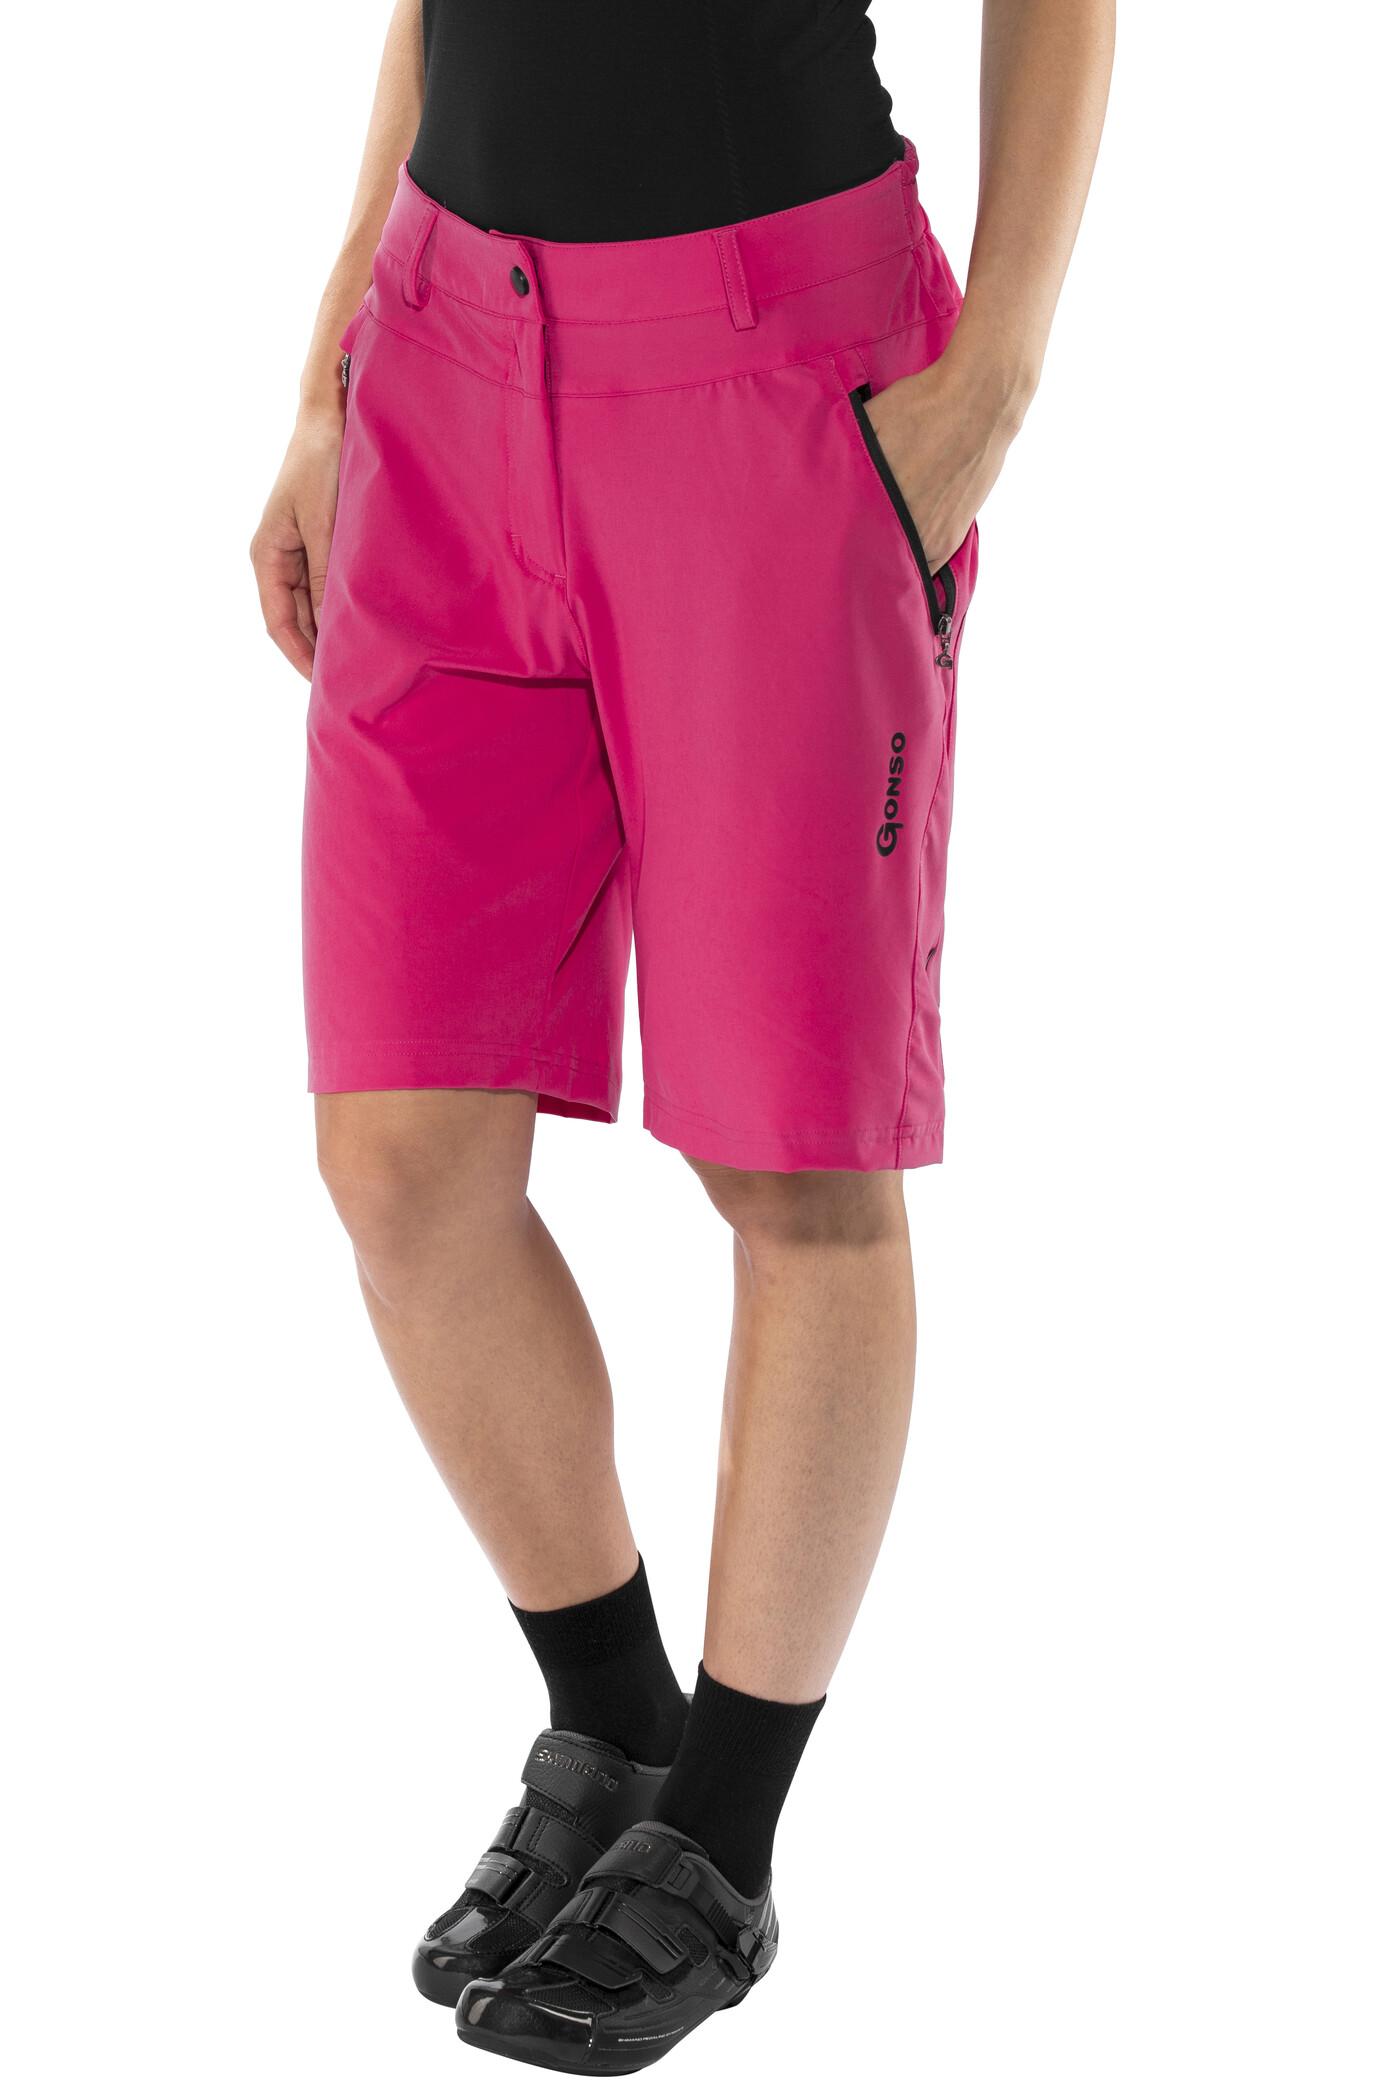 Fox Ranger Baggy Shorts Damen Purple Haze 2019 Fahrradhose